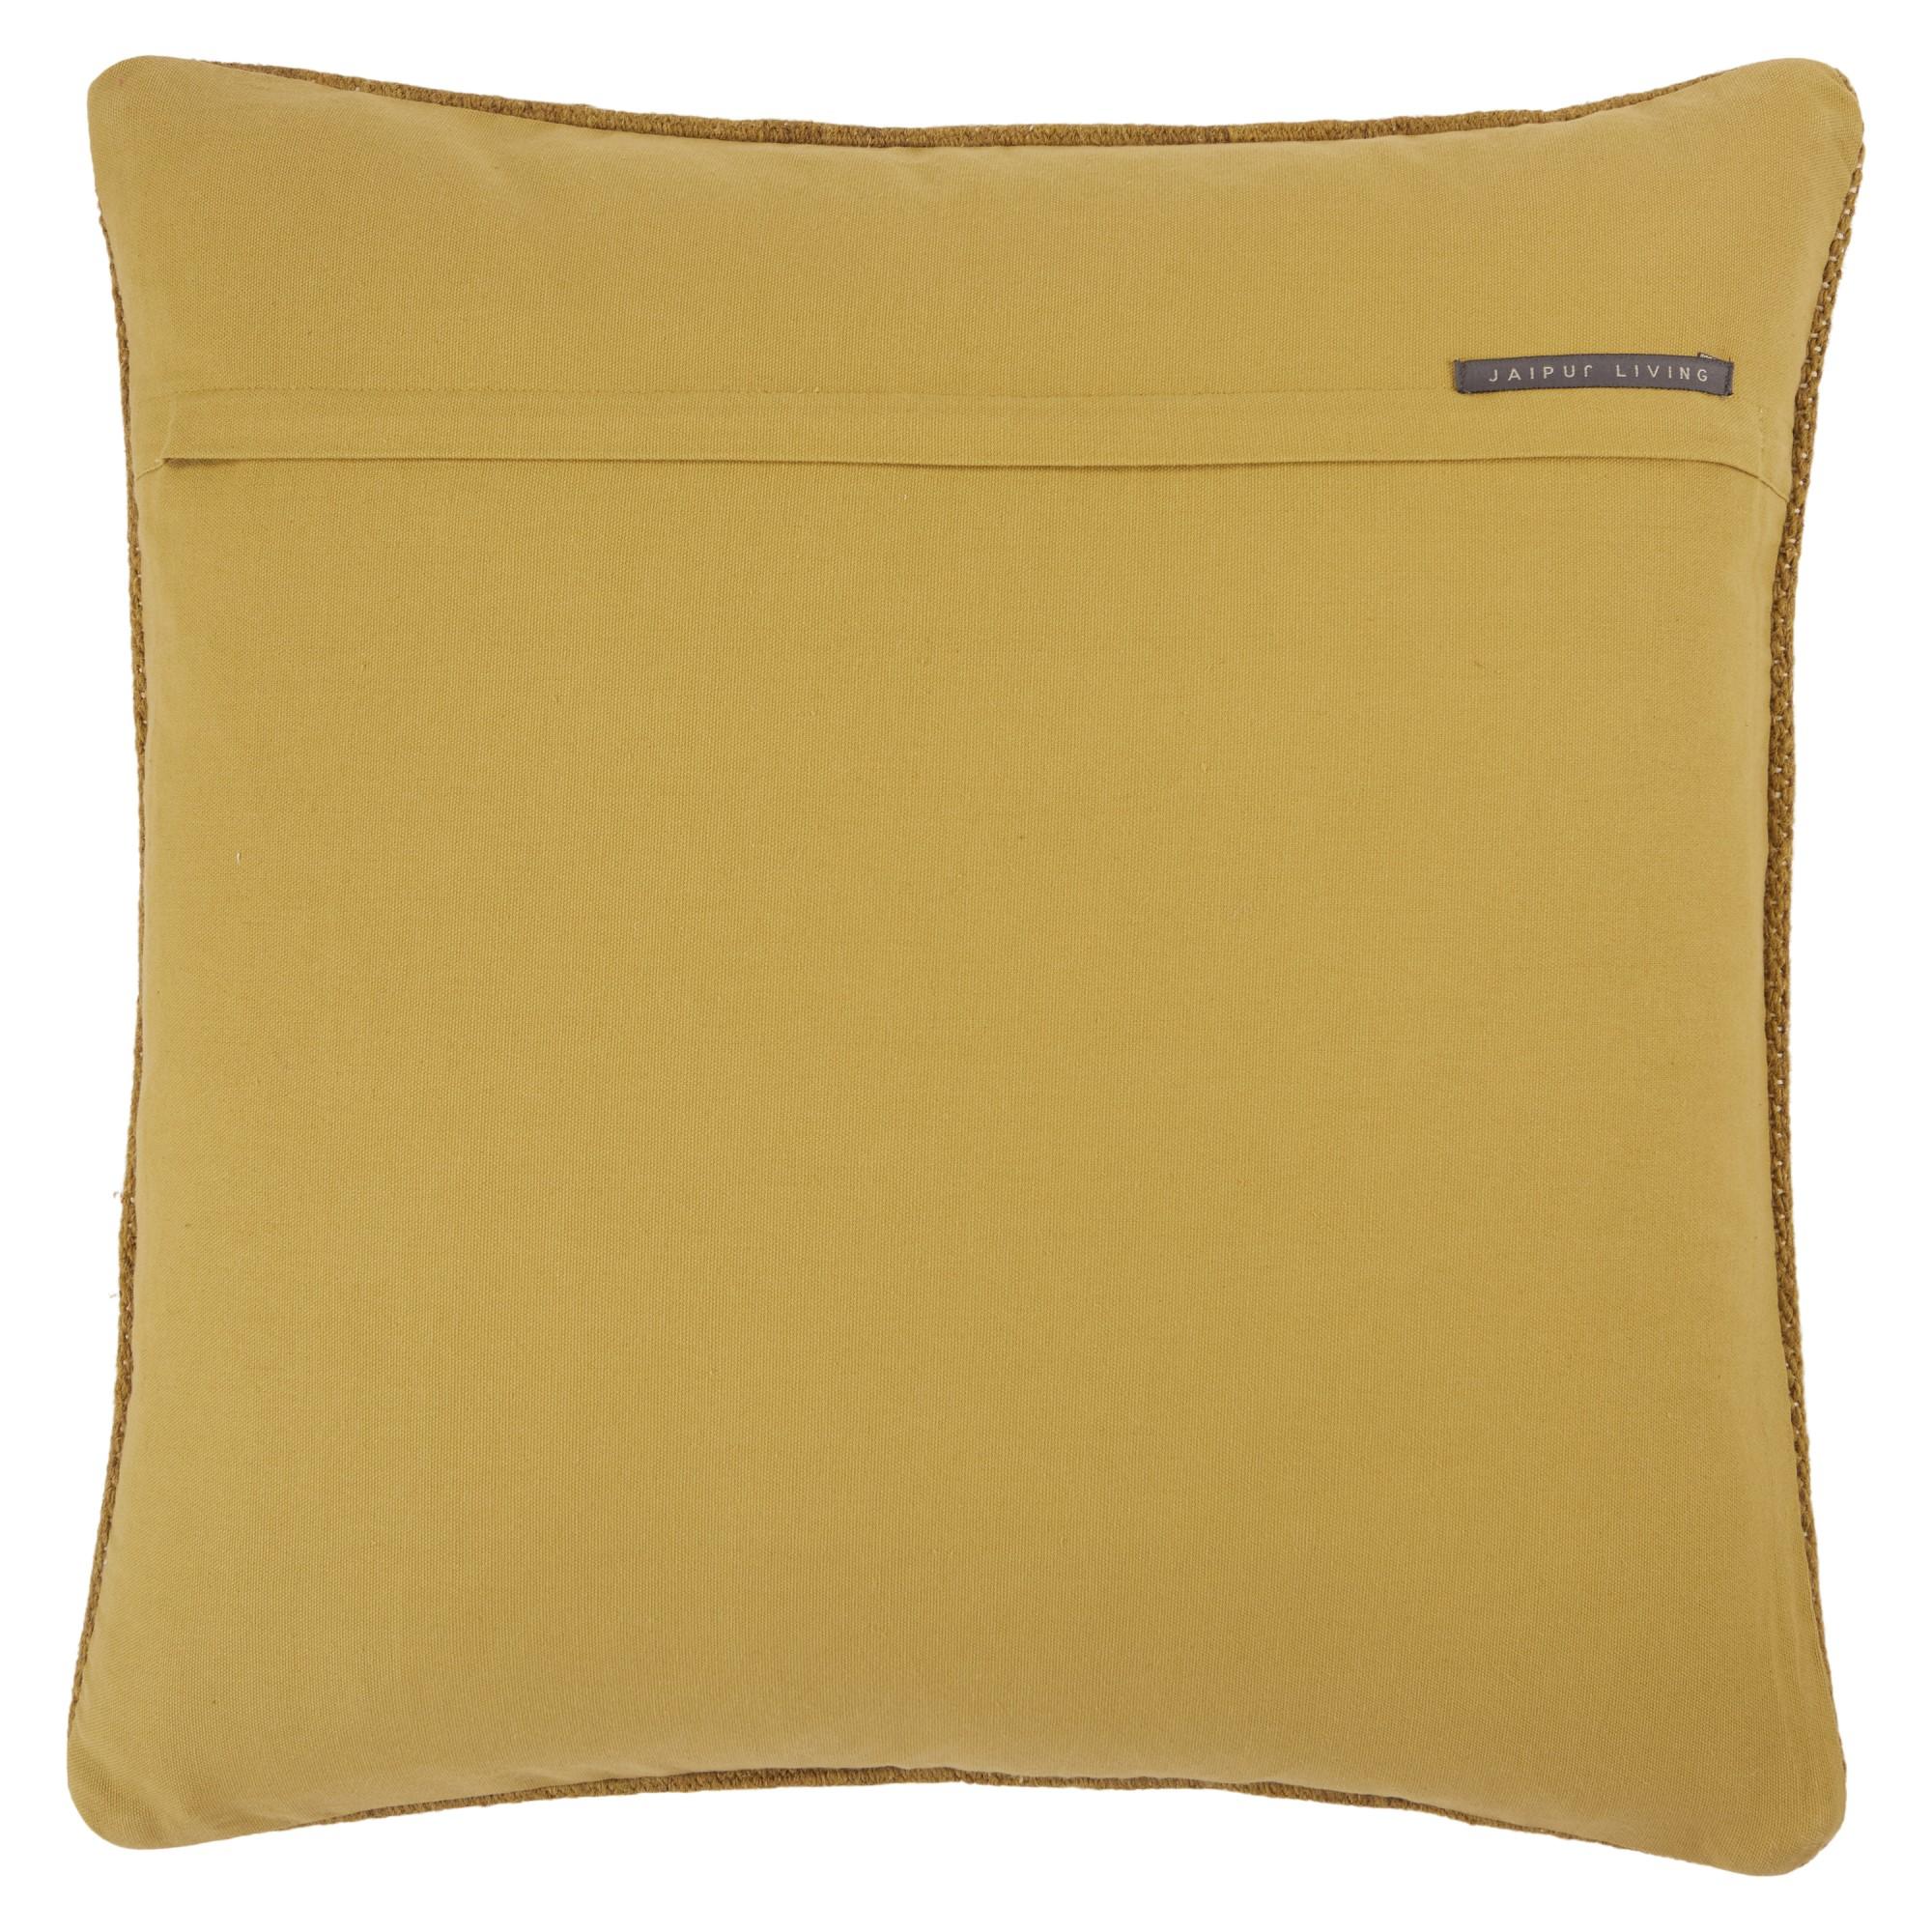 Jaipur Living Puebla Pillow Sagira Bohemian Global Nomad Pillows Rugs Direct